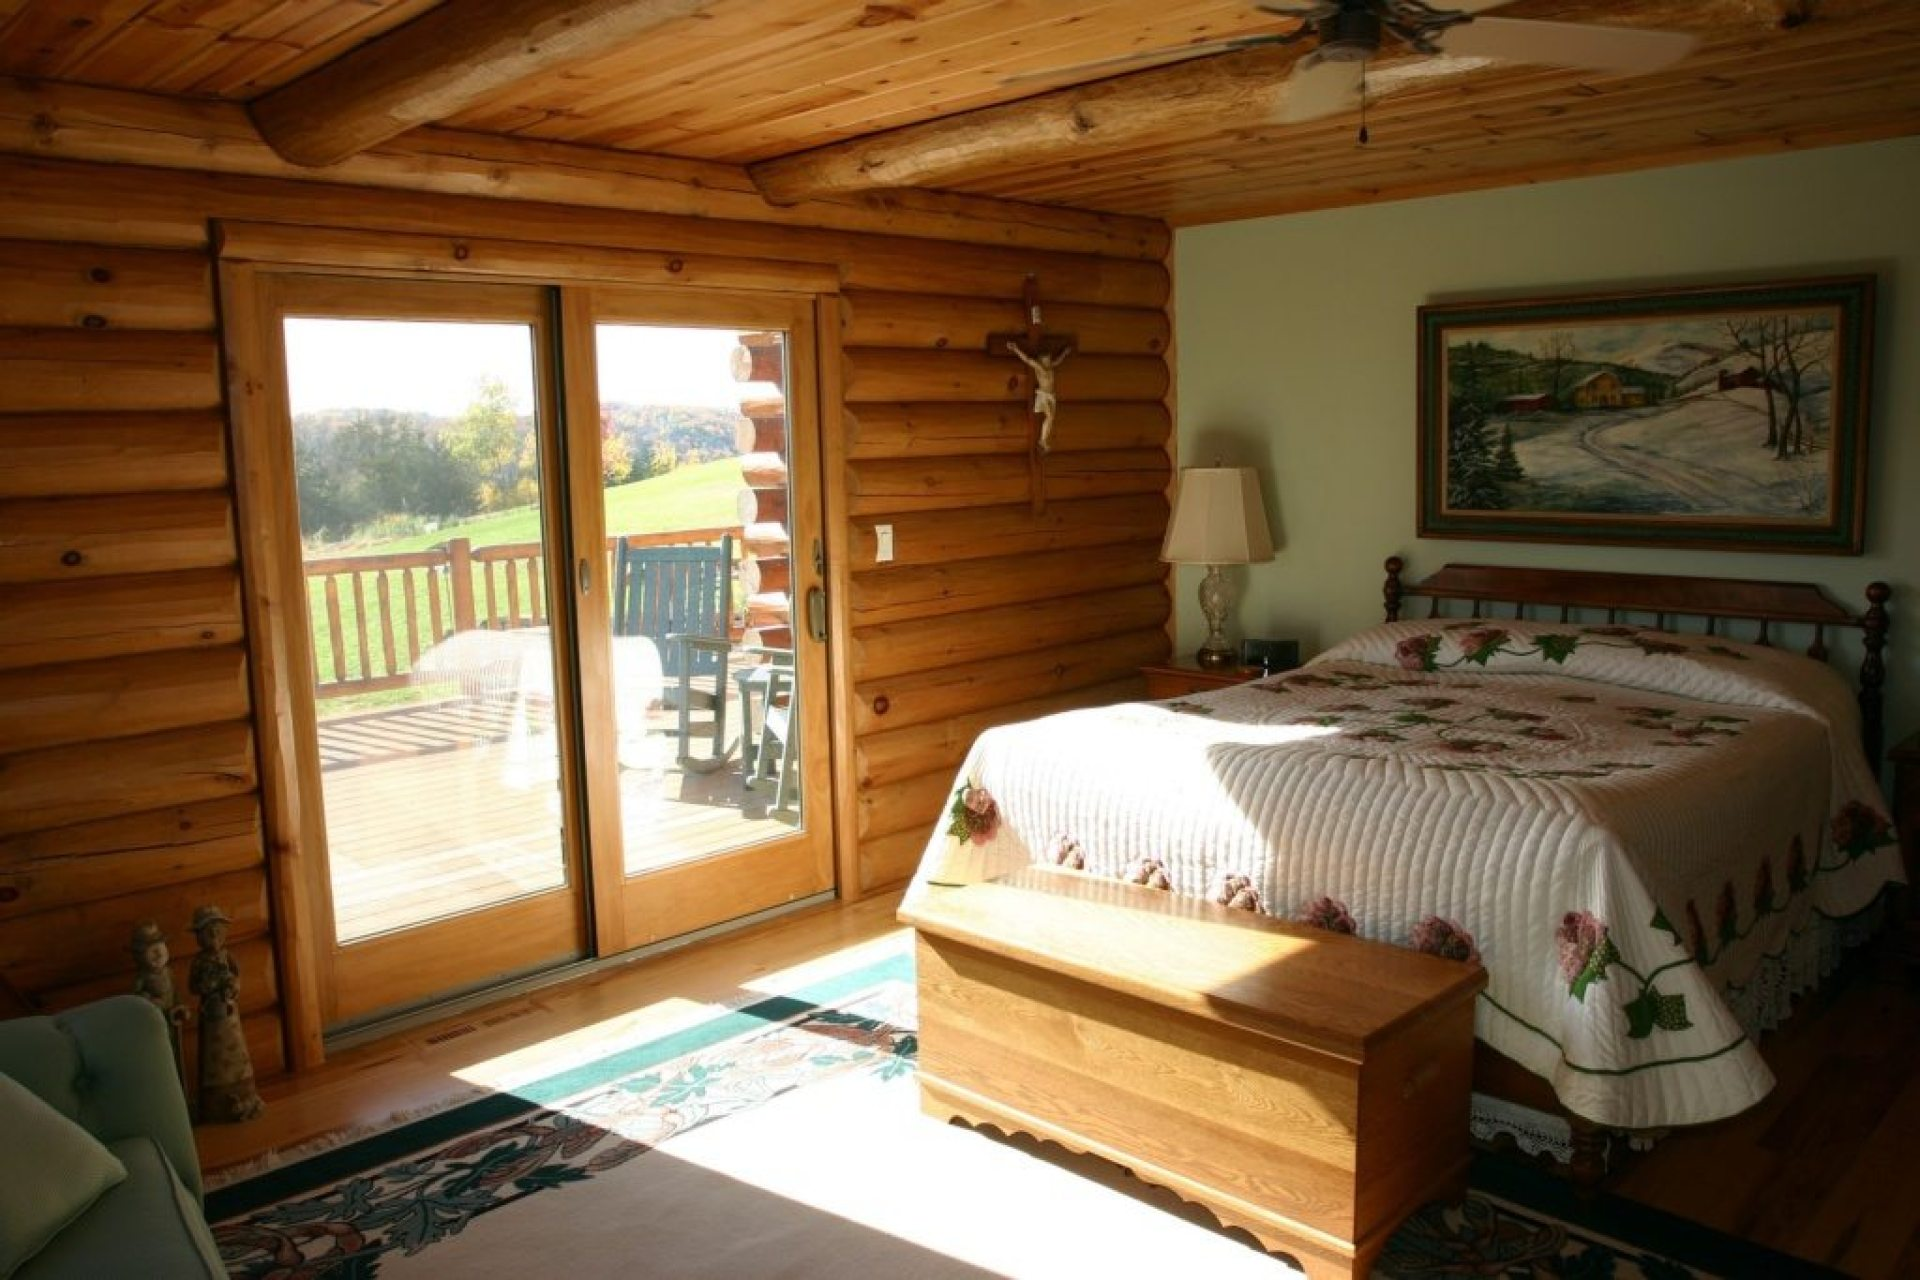 master-bedroom-96086_1920